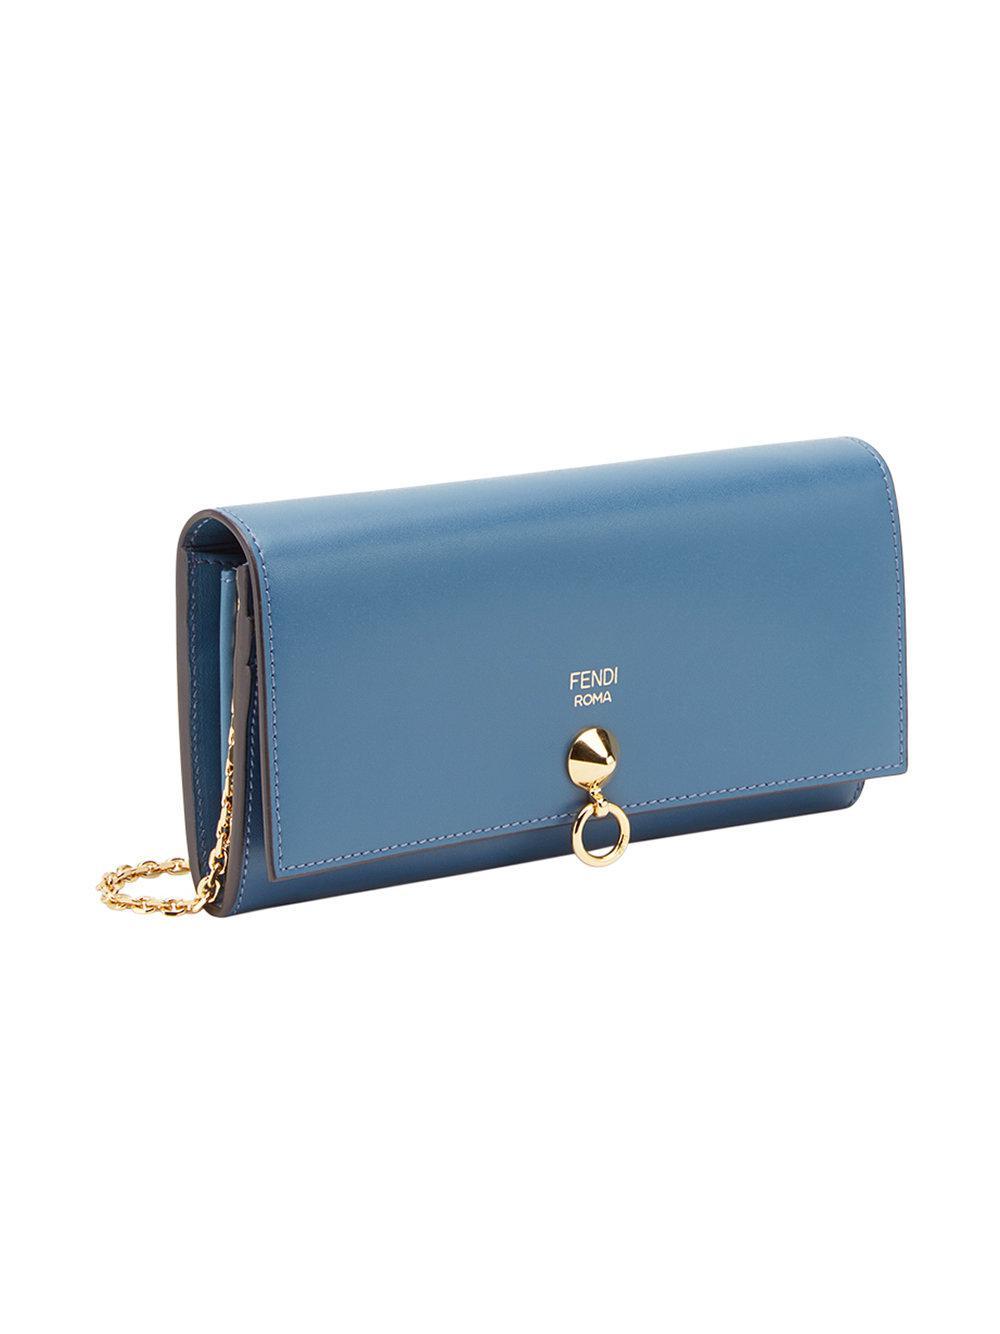 8e038c1147f5 Lyst - Fendi Continental Chain Wallet in Blue